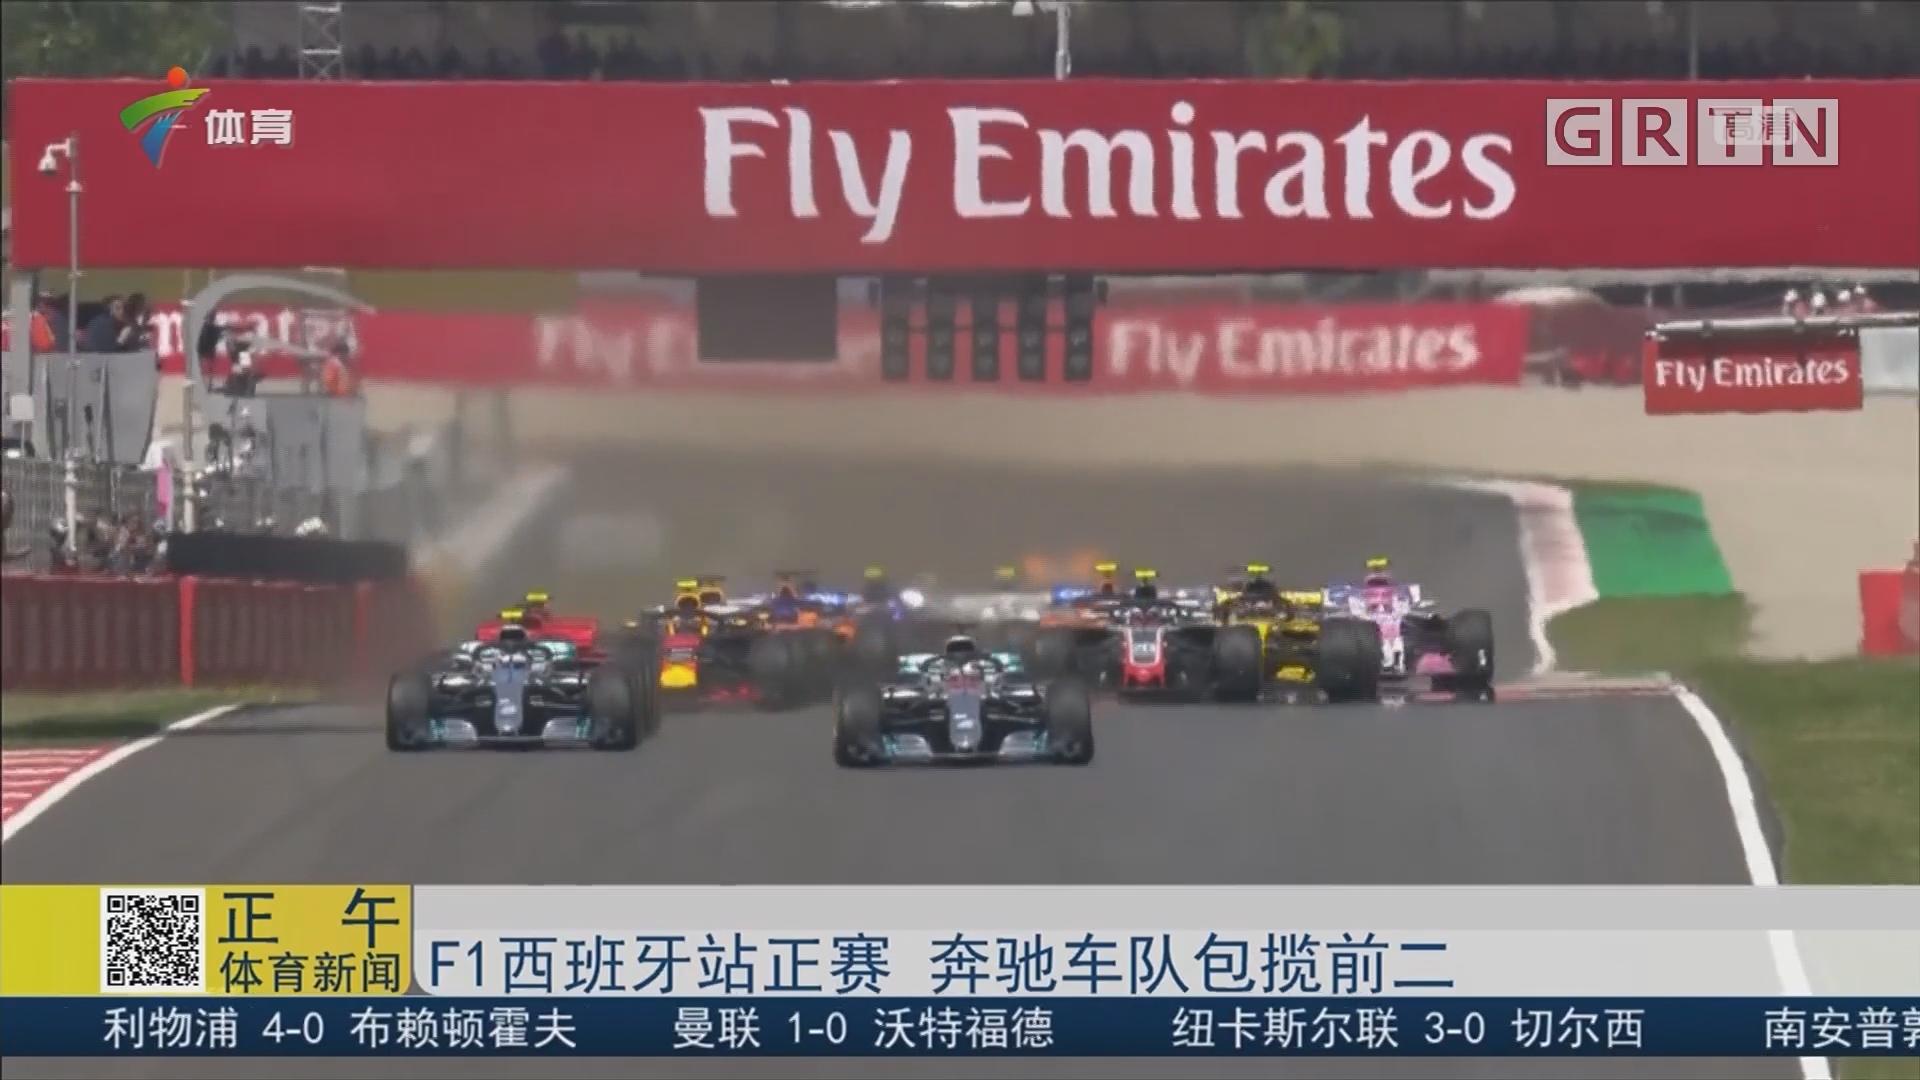 F1西班牙正赛 奔驰车队包揽前二